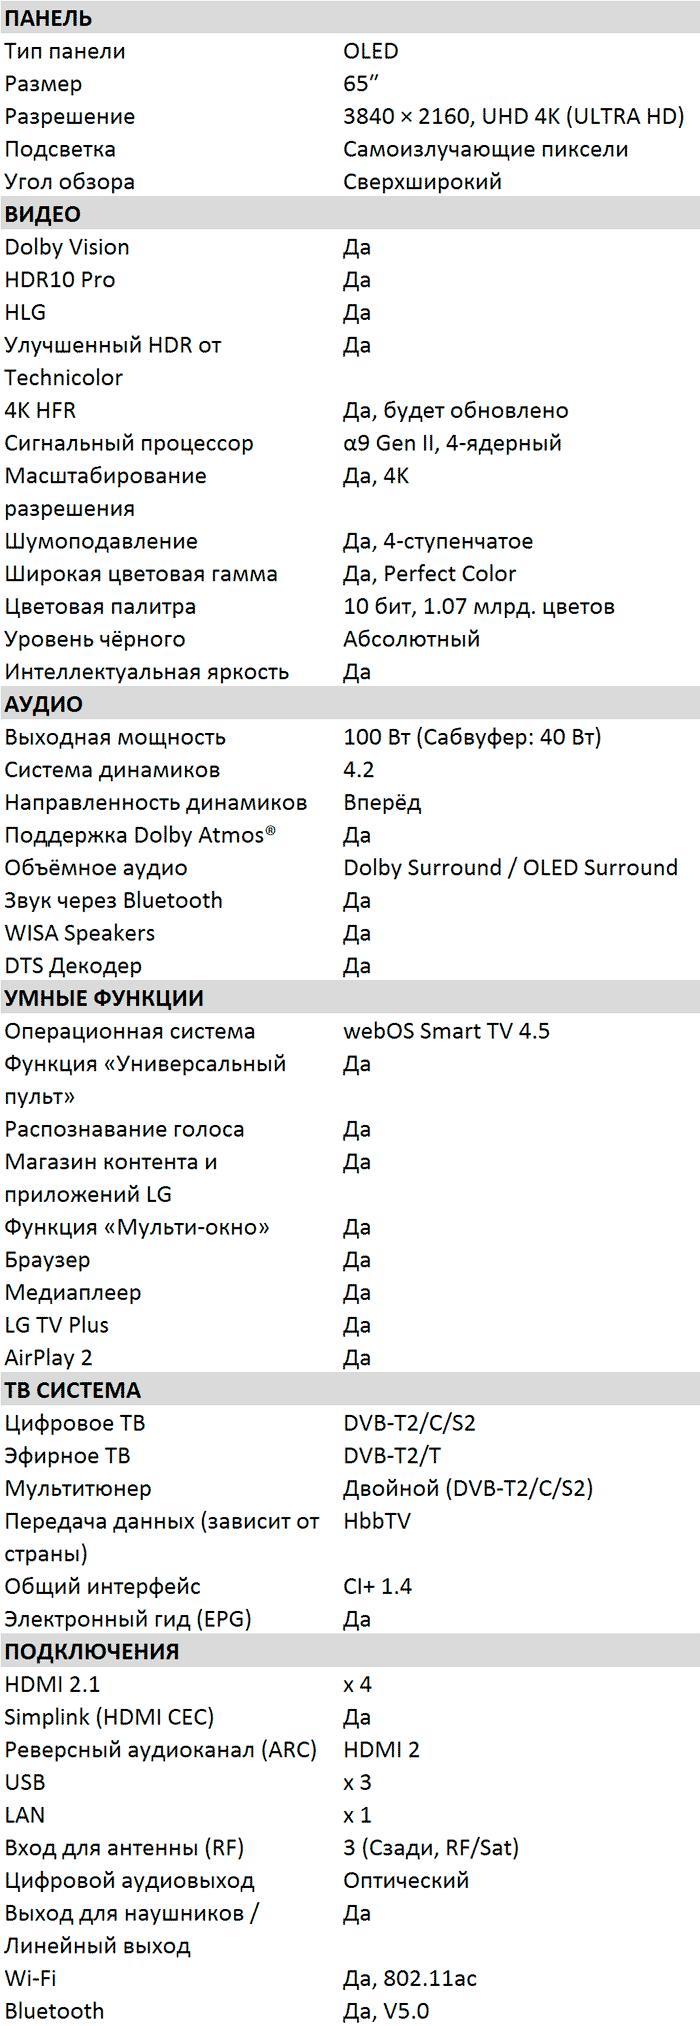 Характеристики TV R9